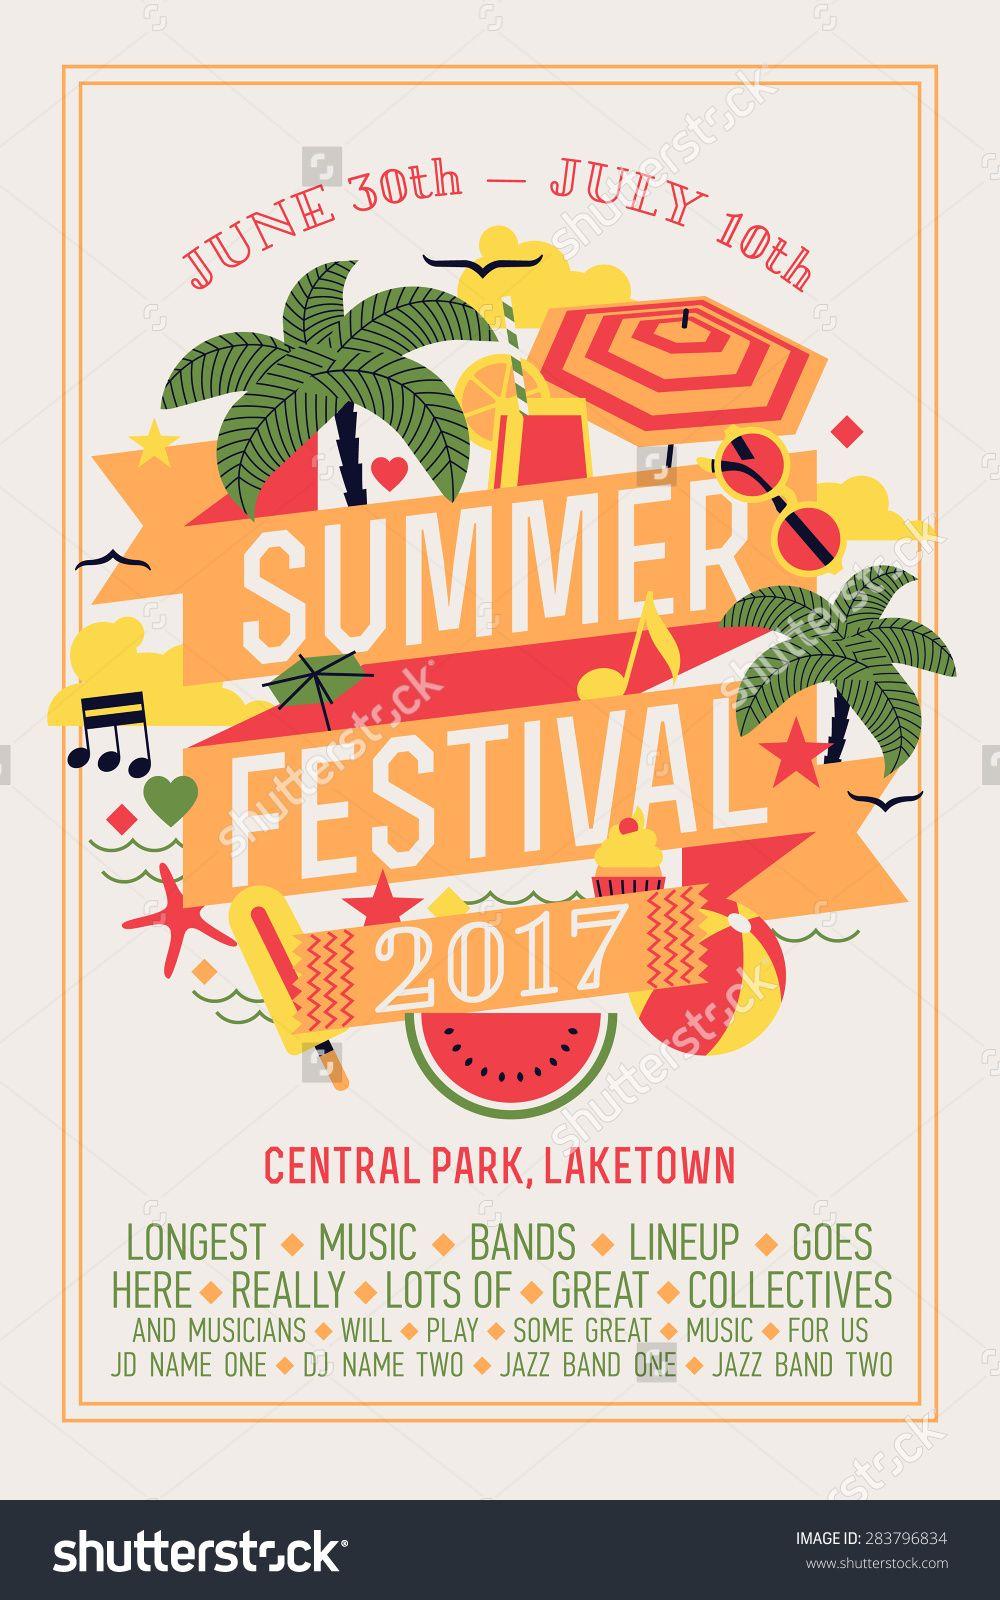 image result for summer festival poster